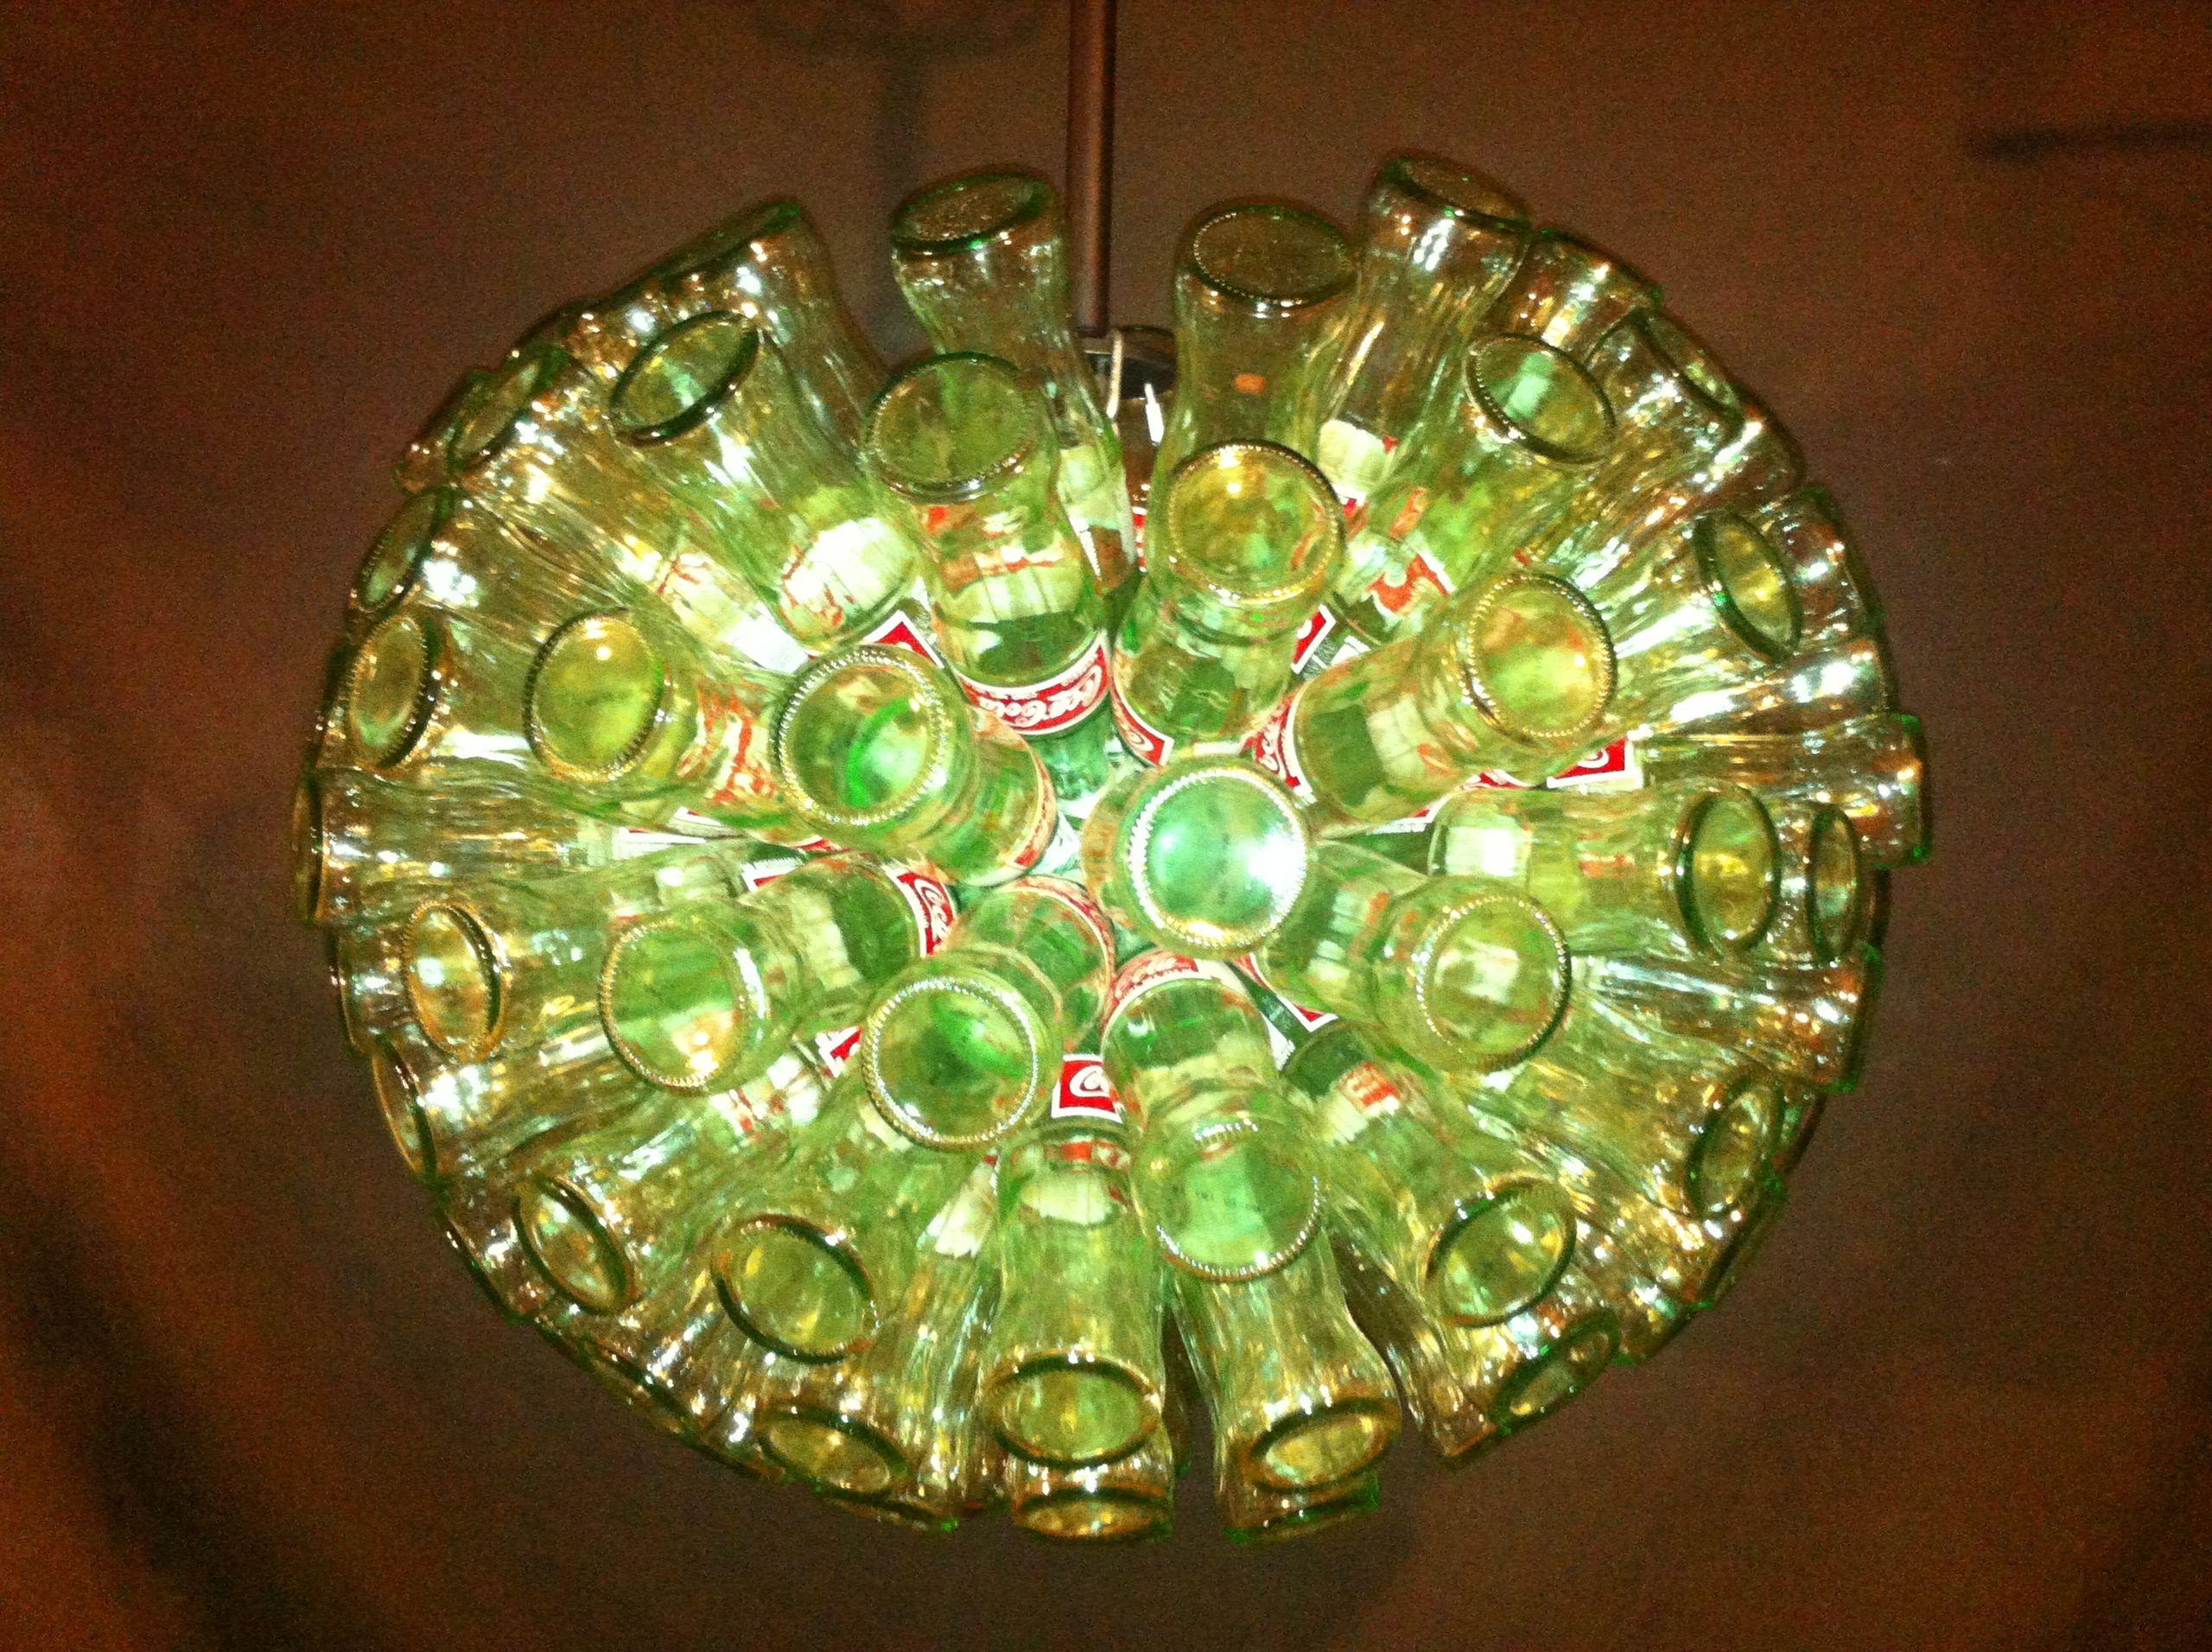 Coca cola bottle chandelier coke photo from fanpop recycled coca cola bottle chandelier coke photo from fanpop aloadofball Images